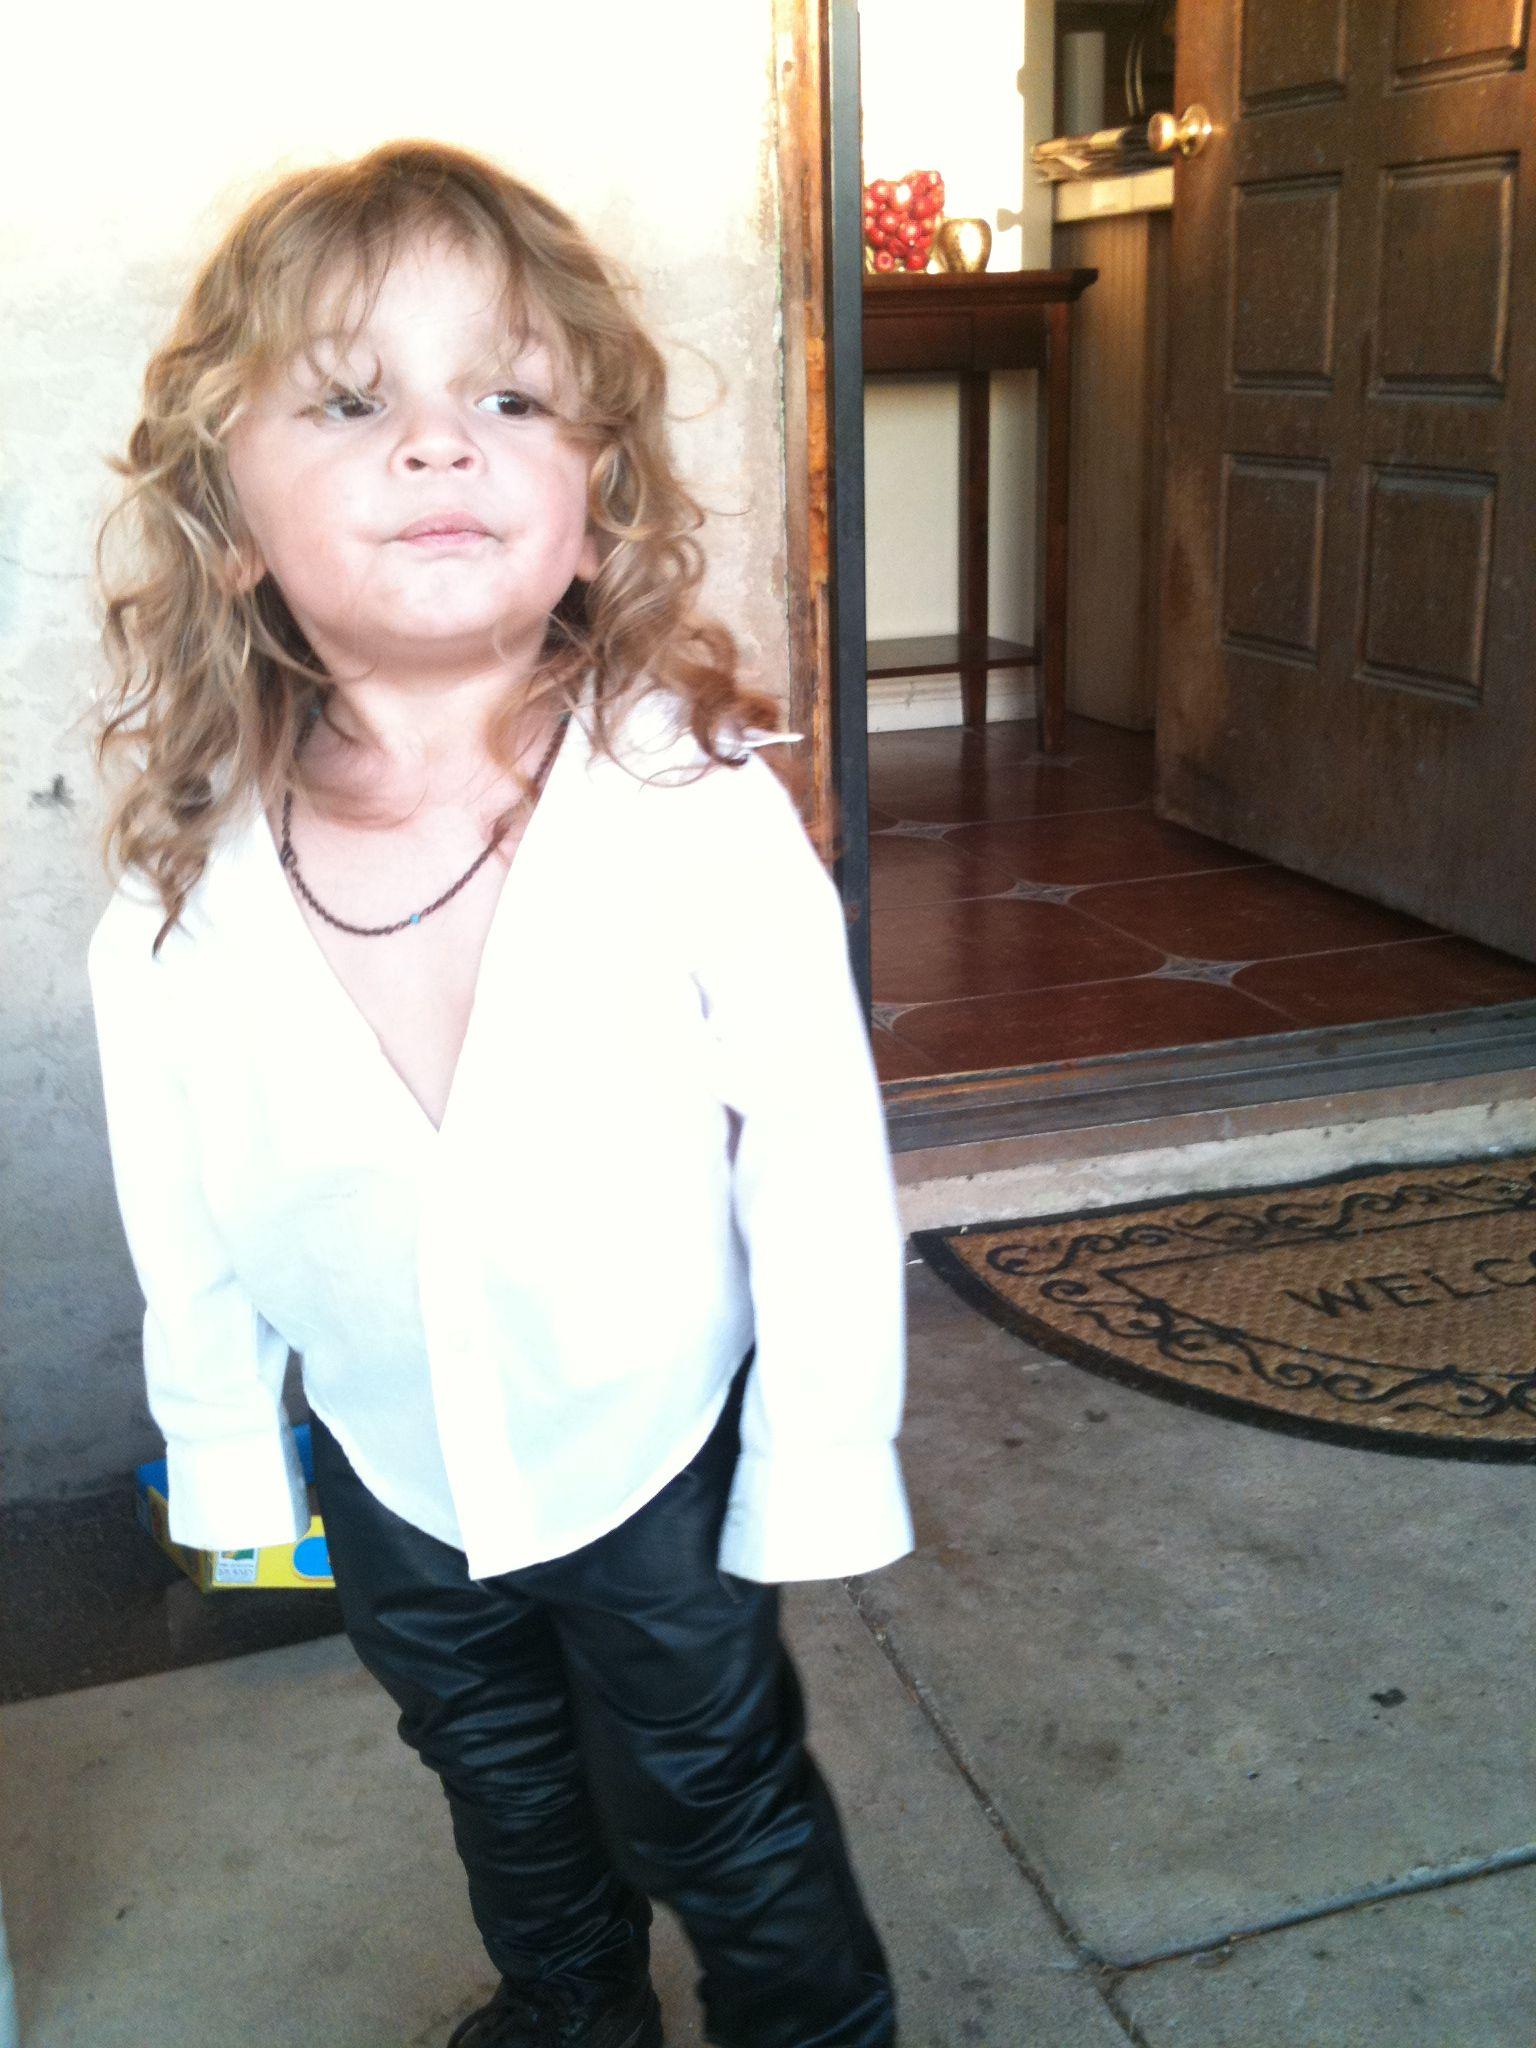 Halloween Jim Morrison Costume Kiddos Jim Morrison Baby